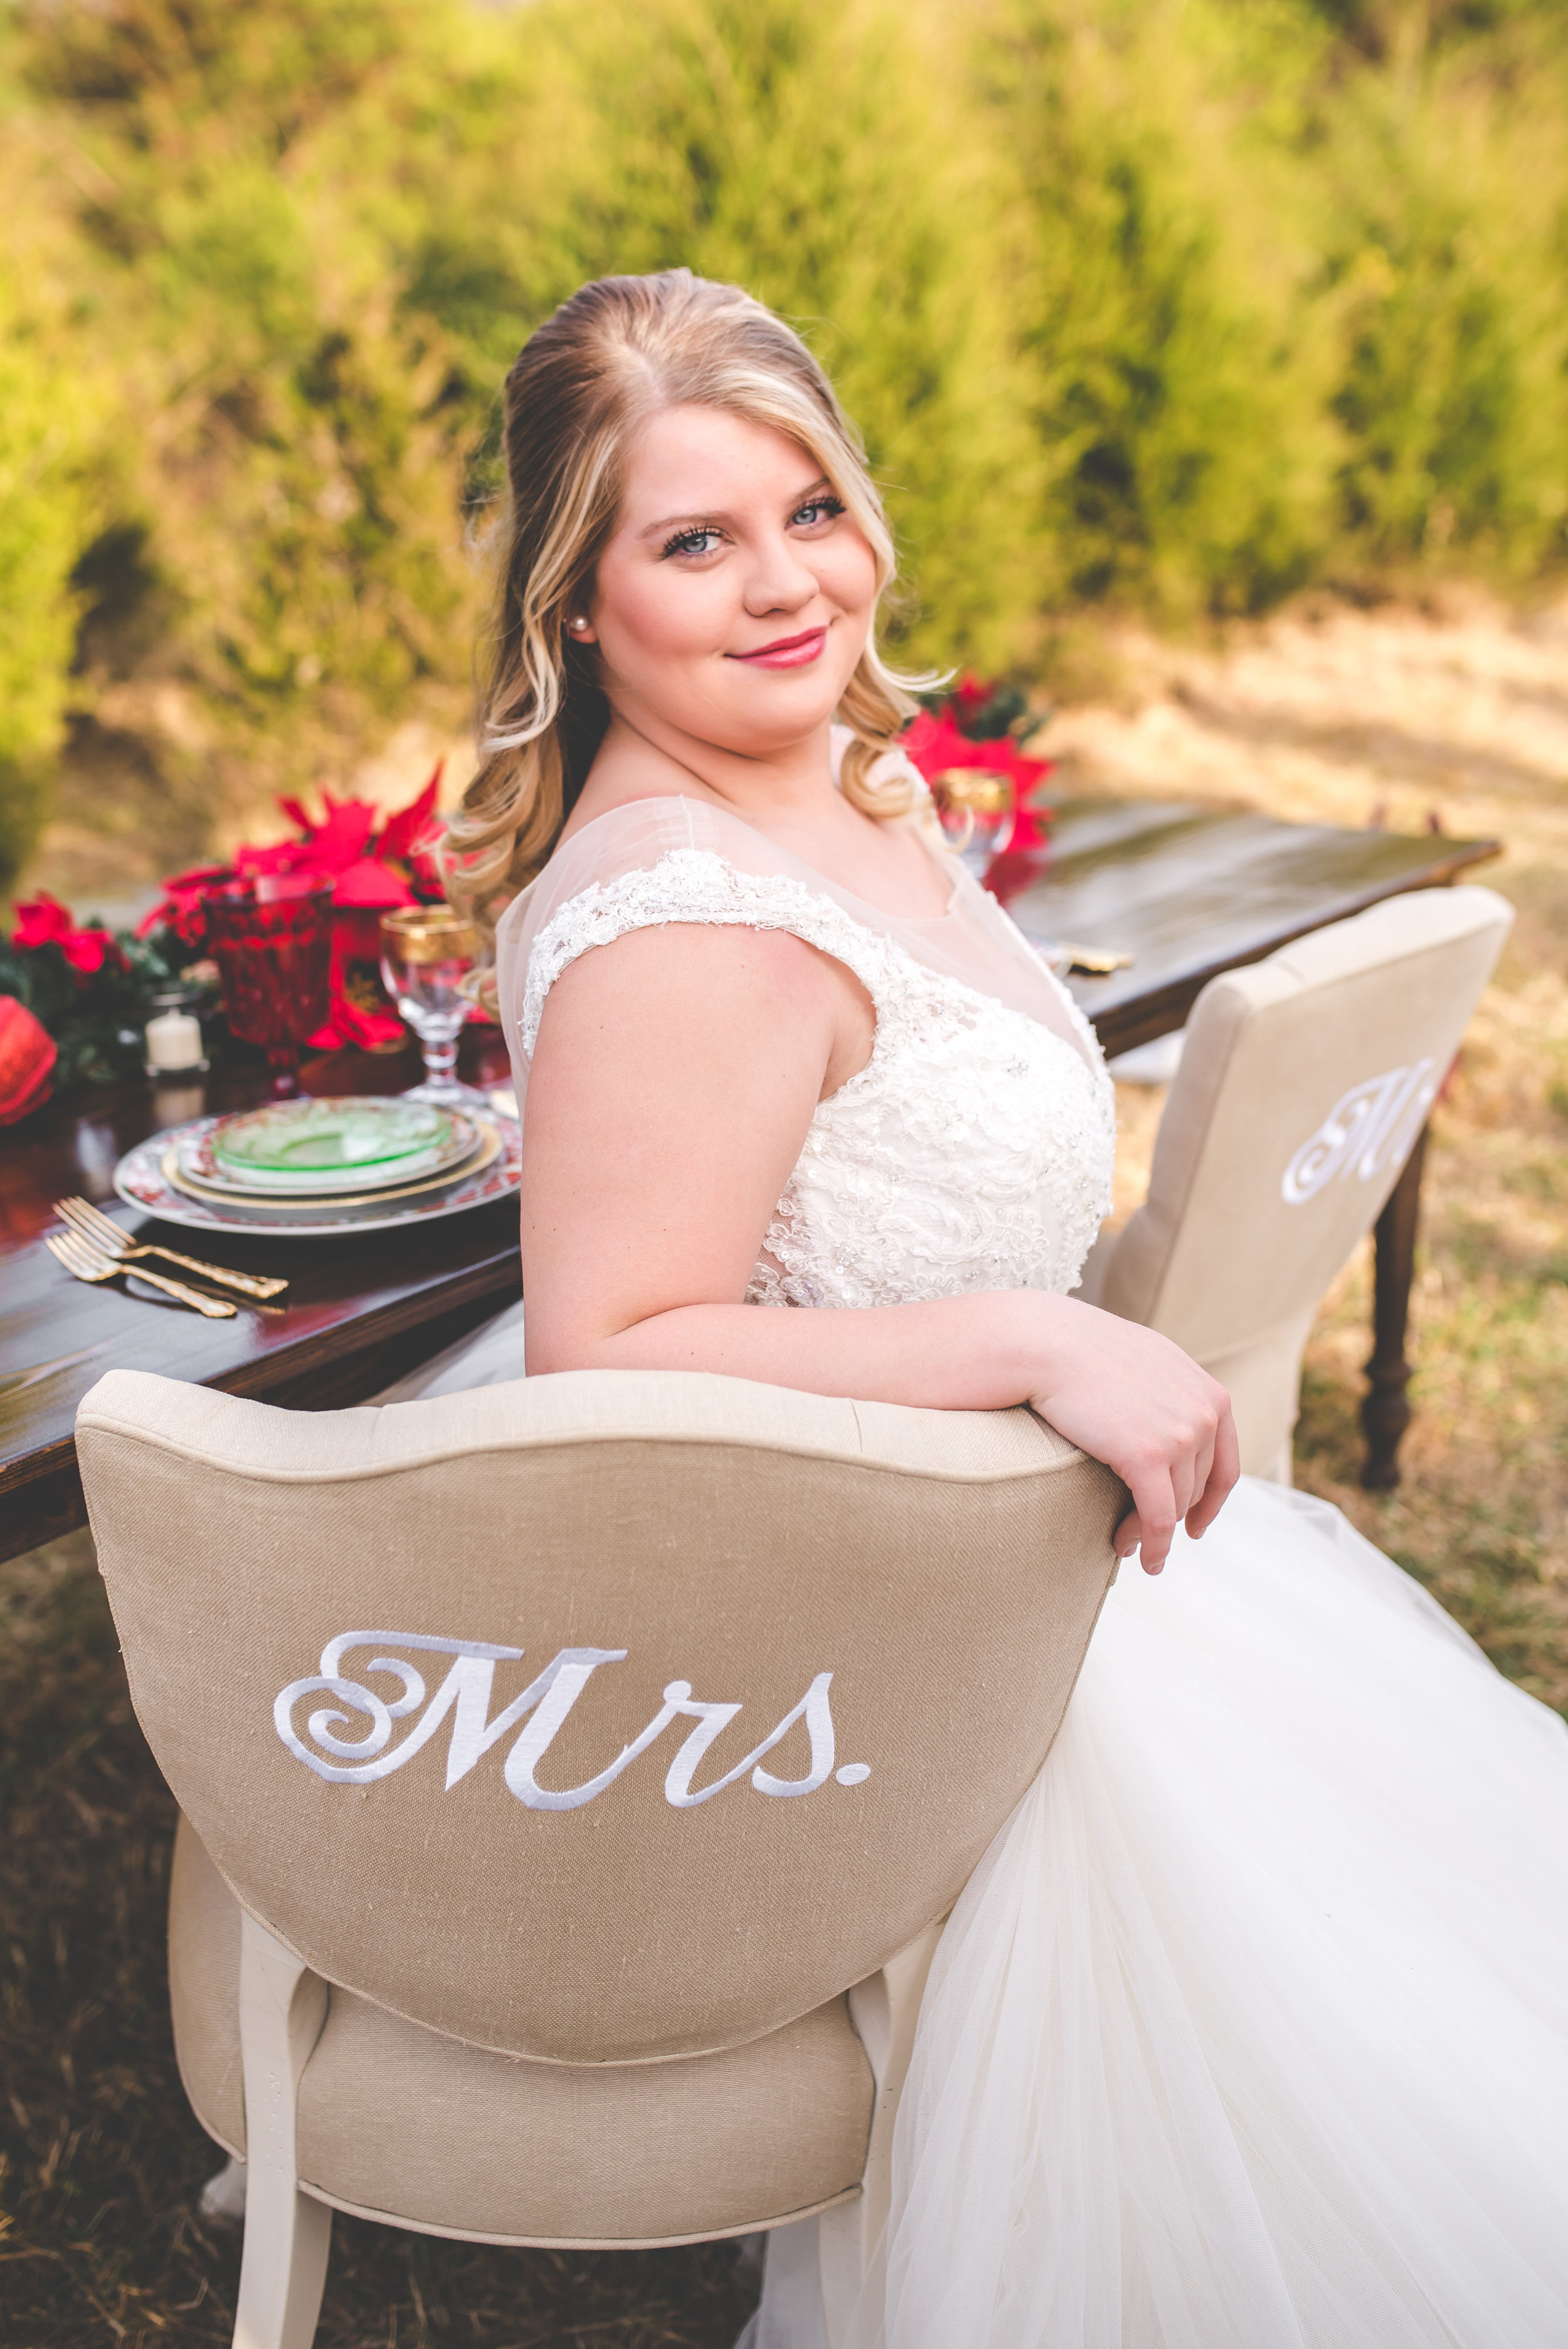 A Carolinas Christmas Inspired Wedding Styled Shoot, Christmas Table Setting - Southernly Studios